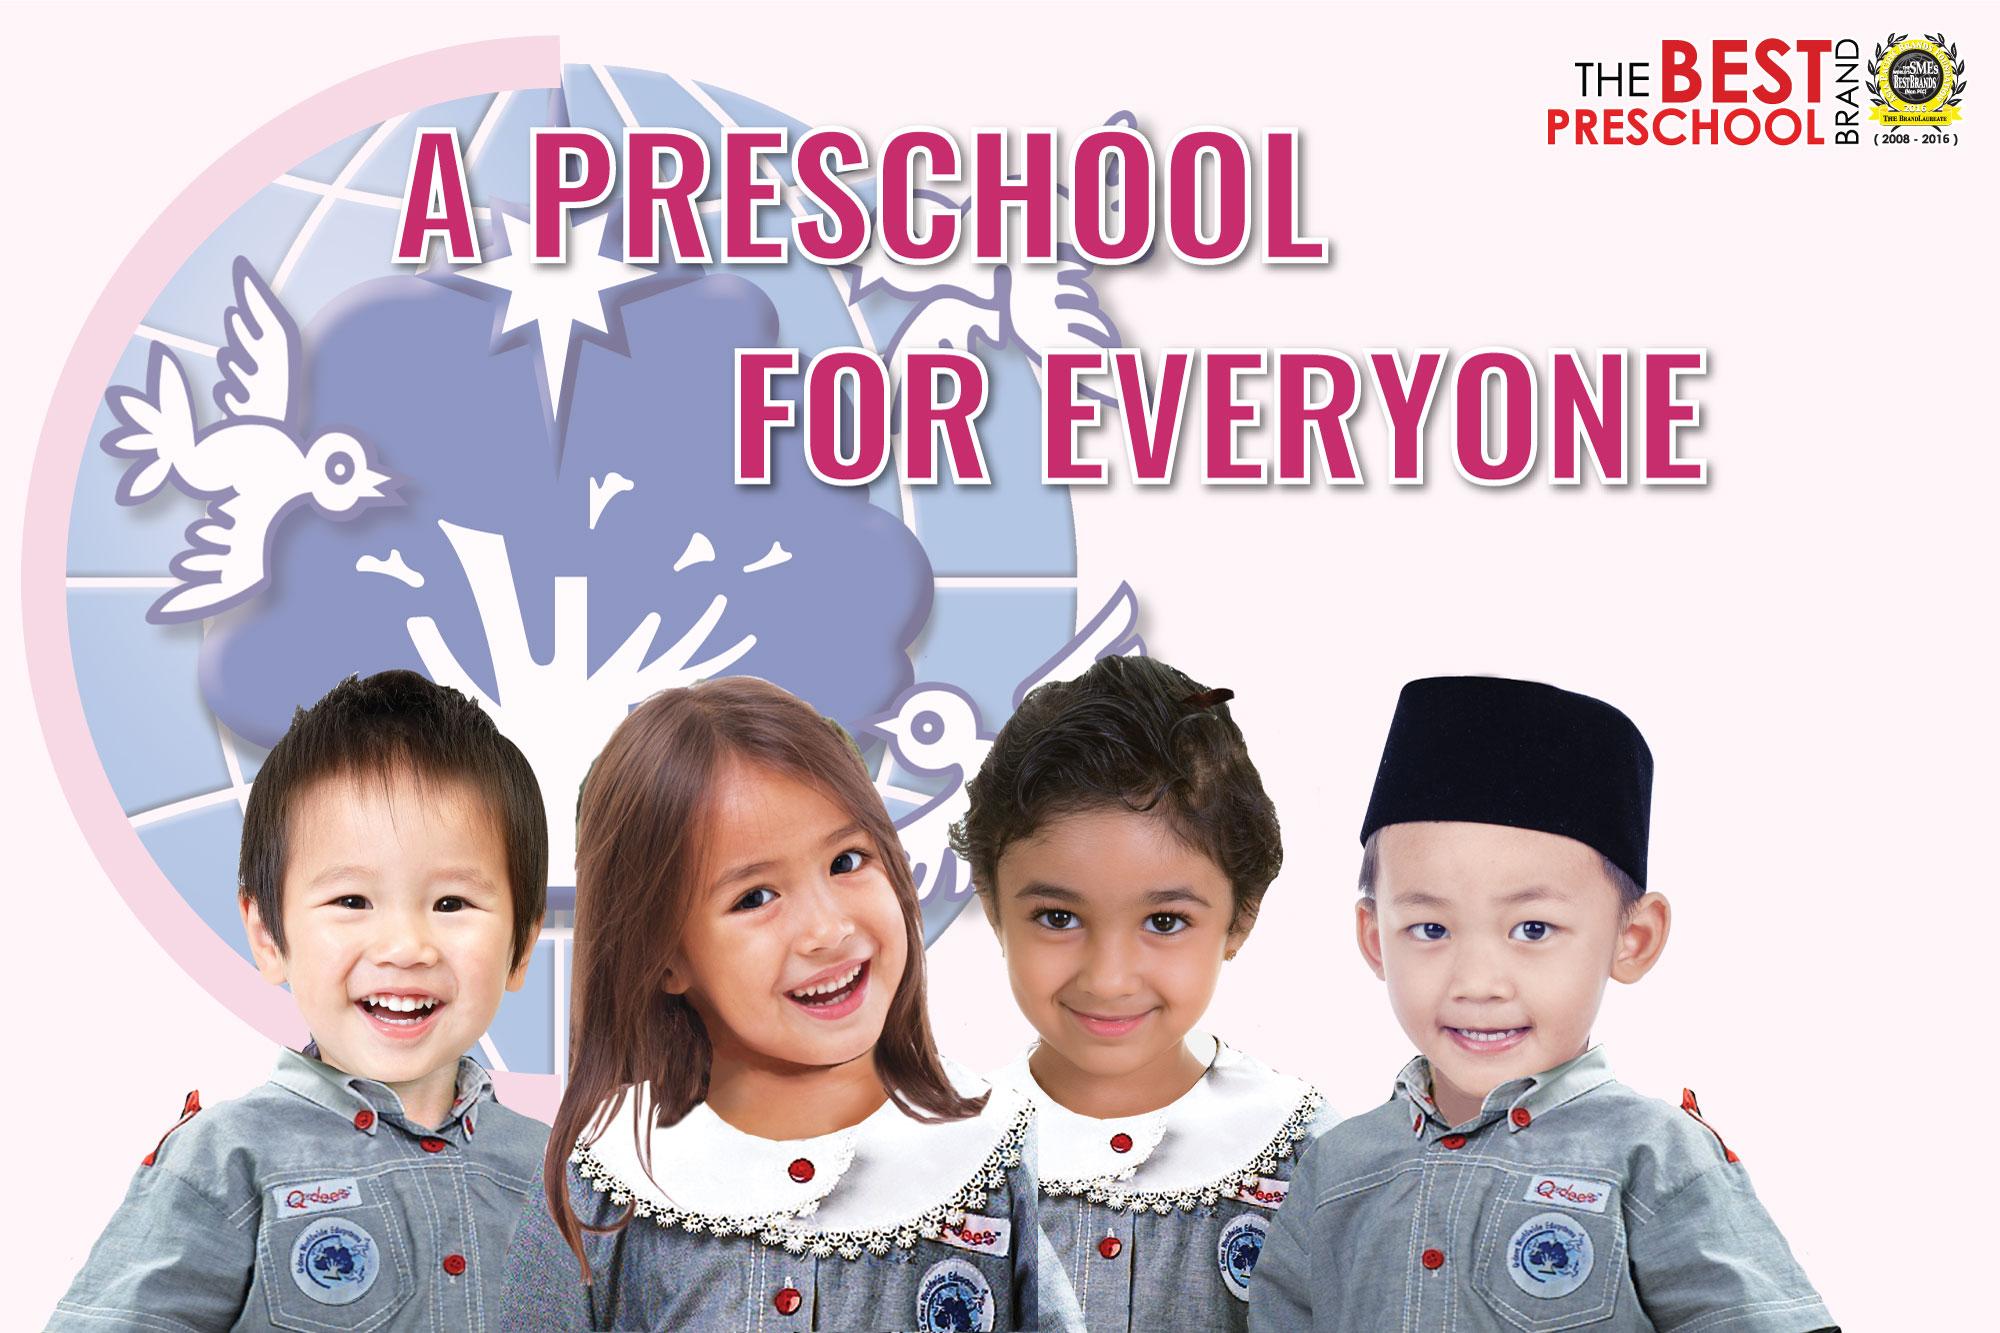 A Preschool For Everyone